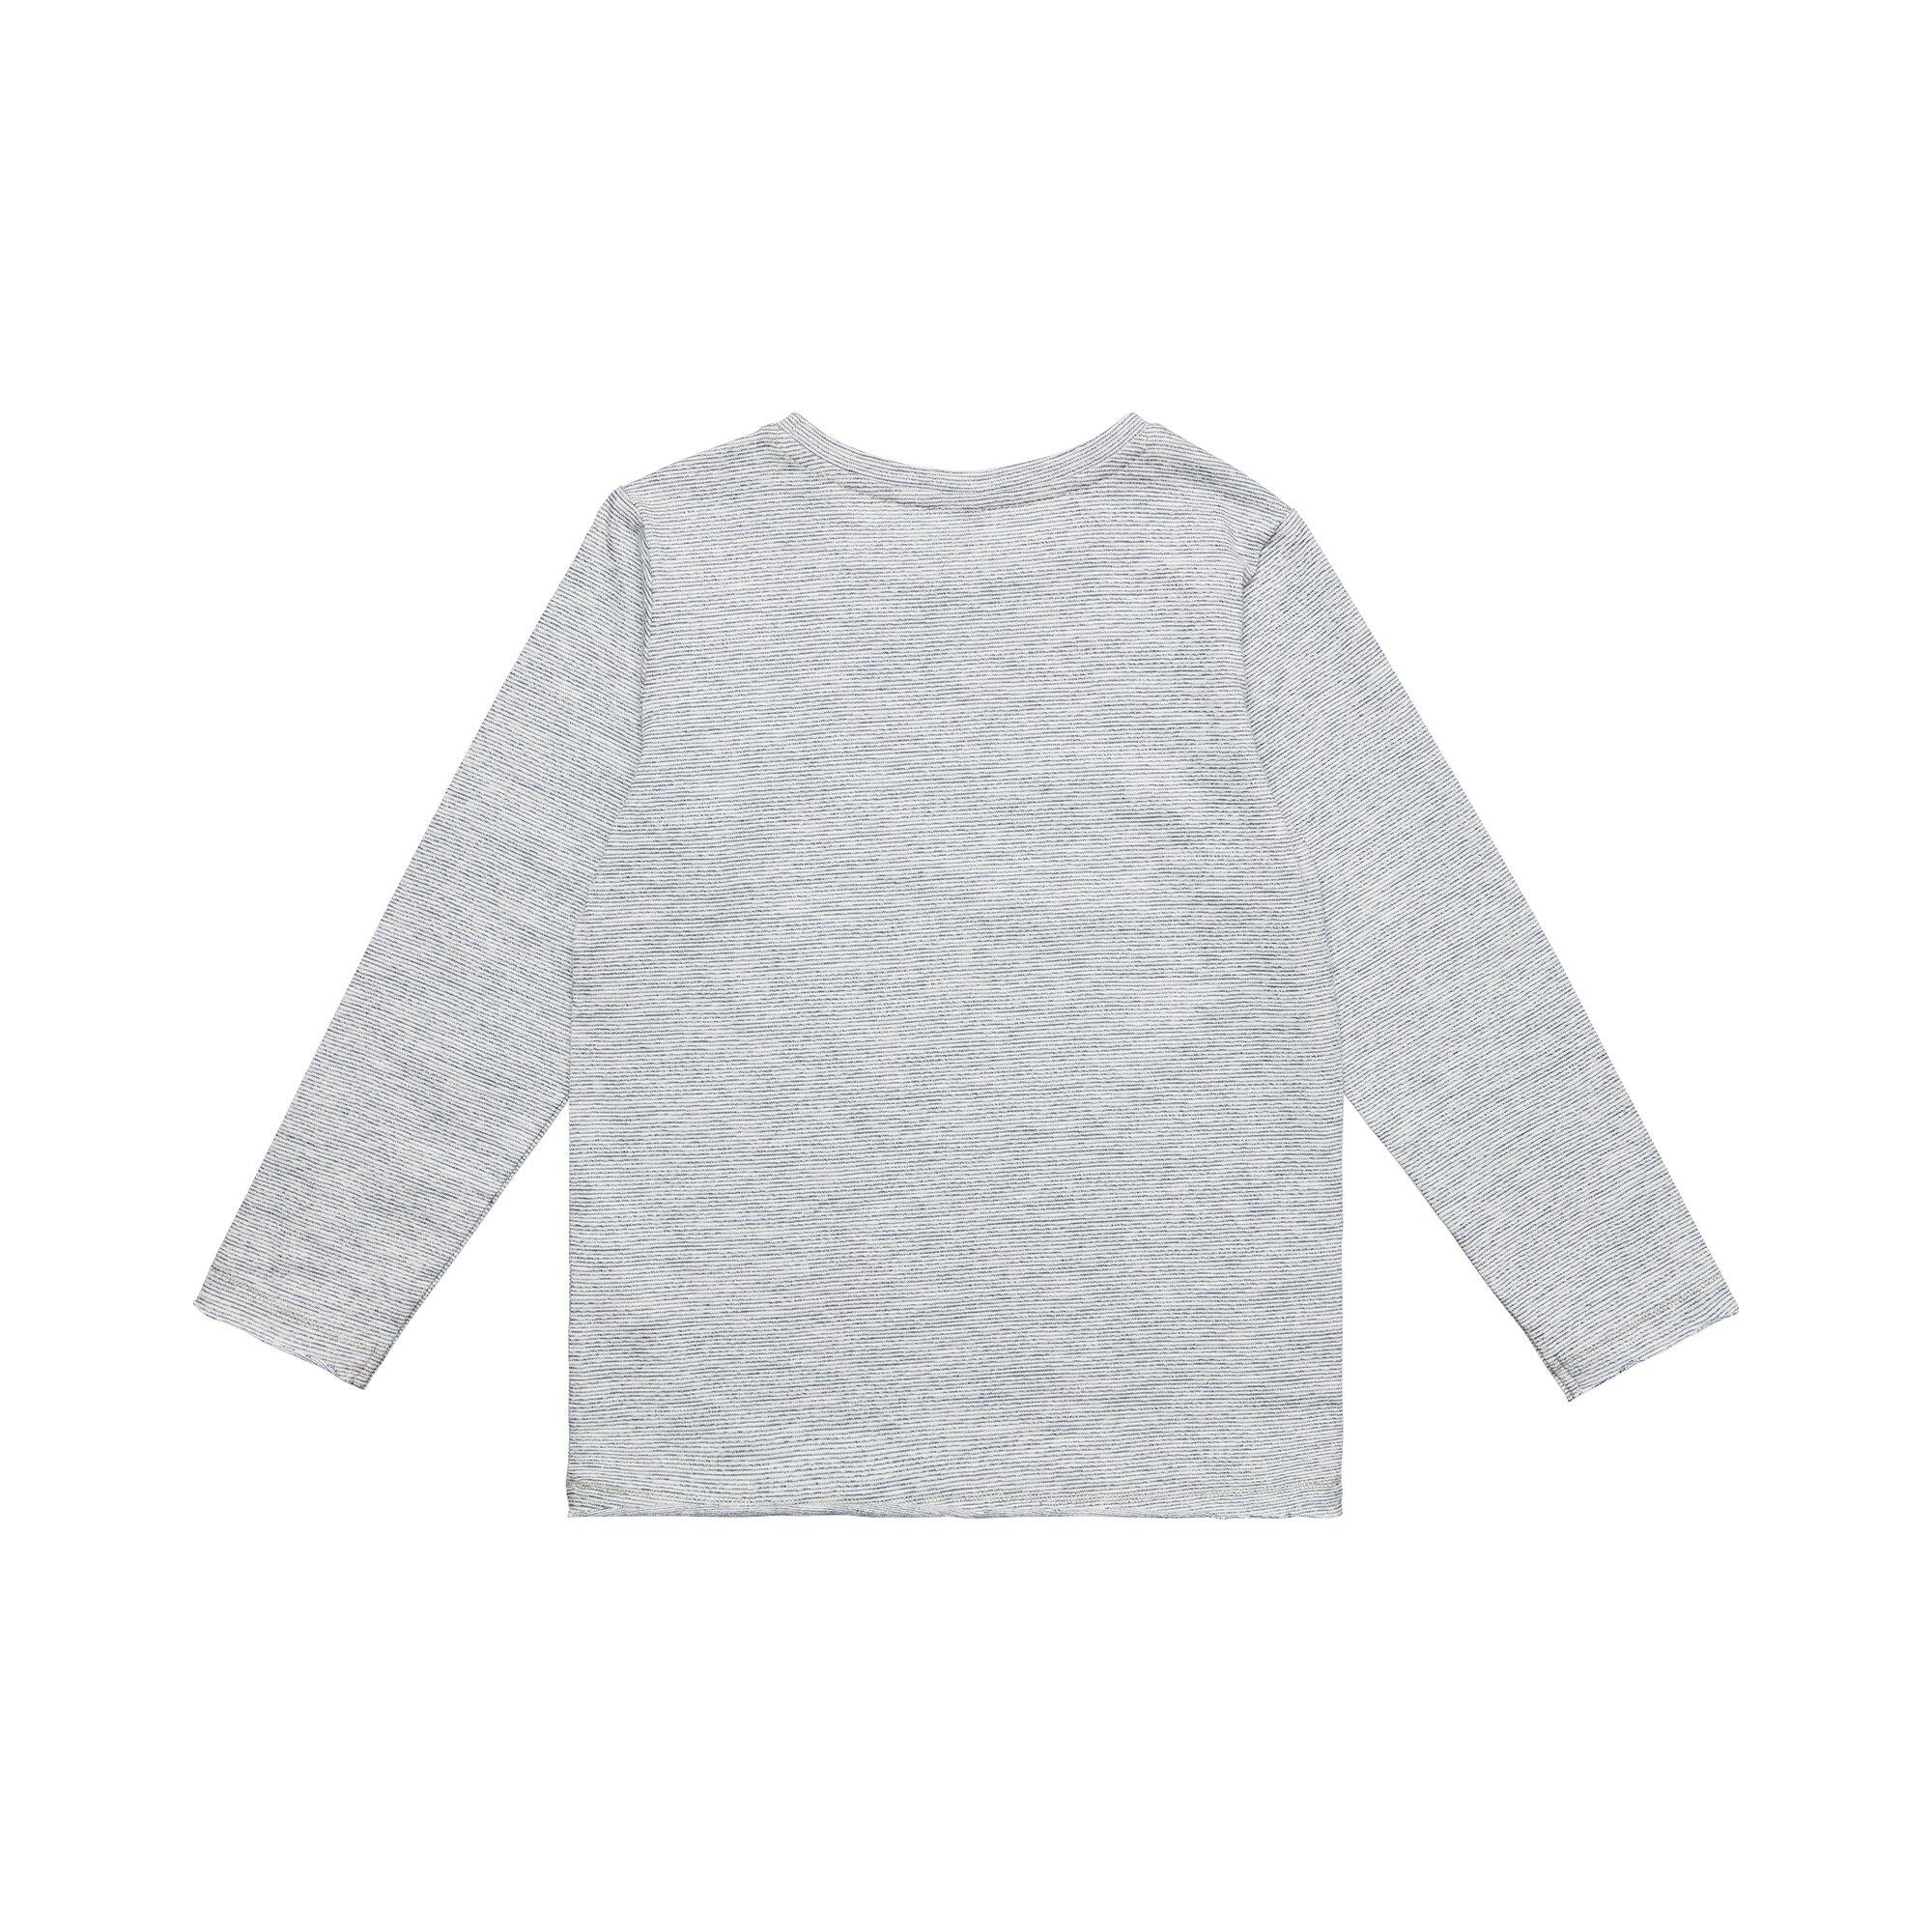 esprit-shirt-langarm-ringel-future-rockstar